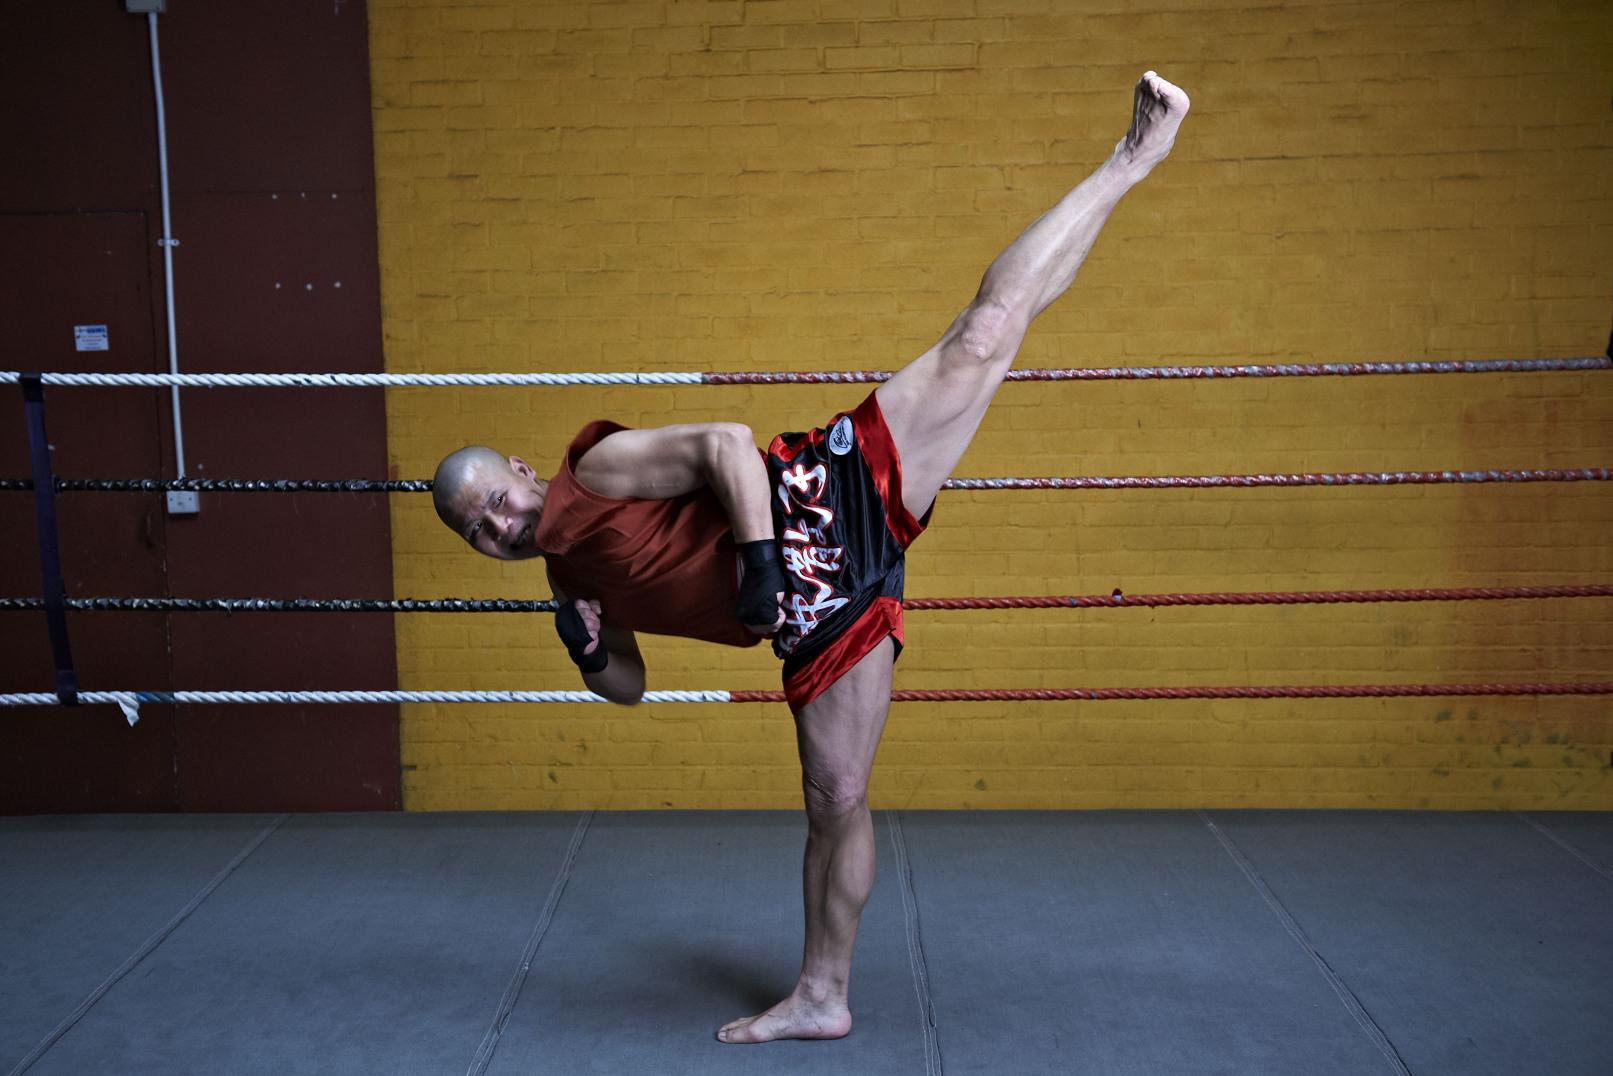 Shaolin temple uk shifu yanzi kick 34.jpg